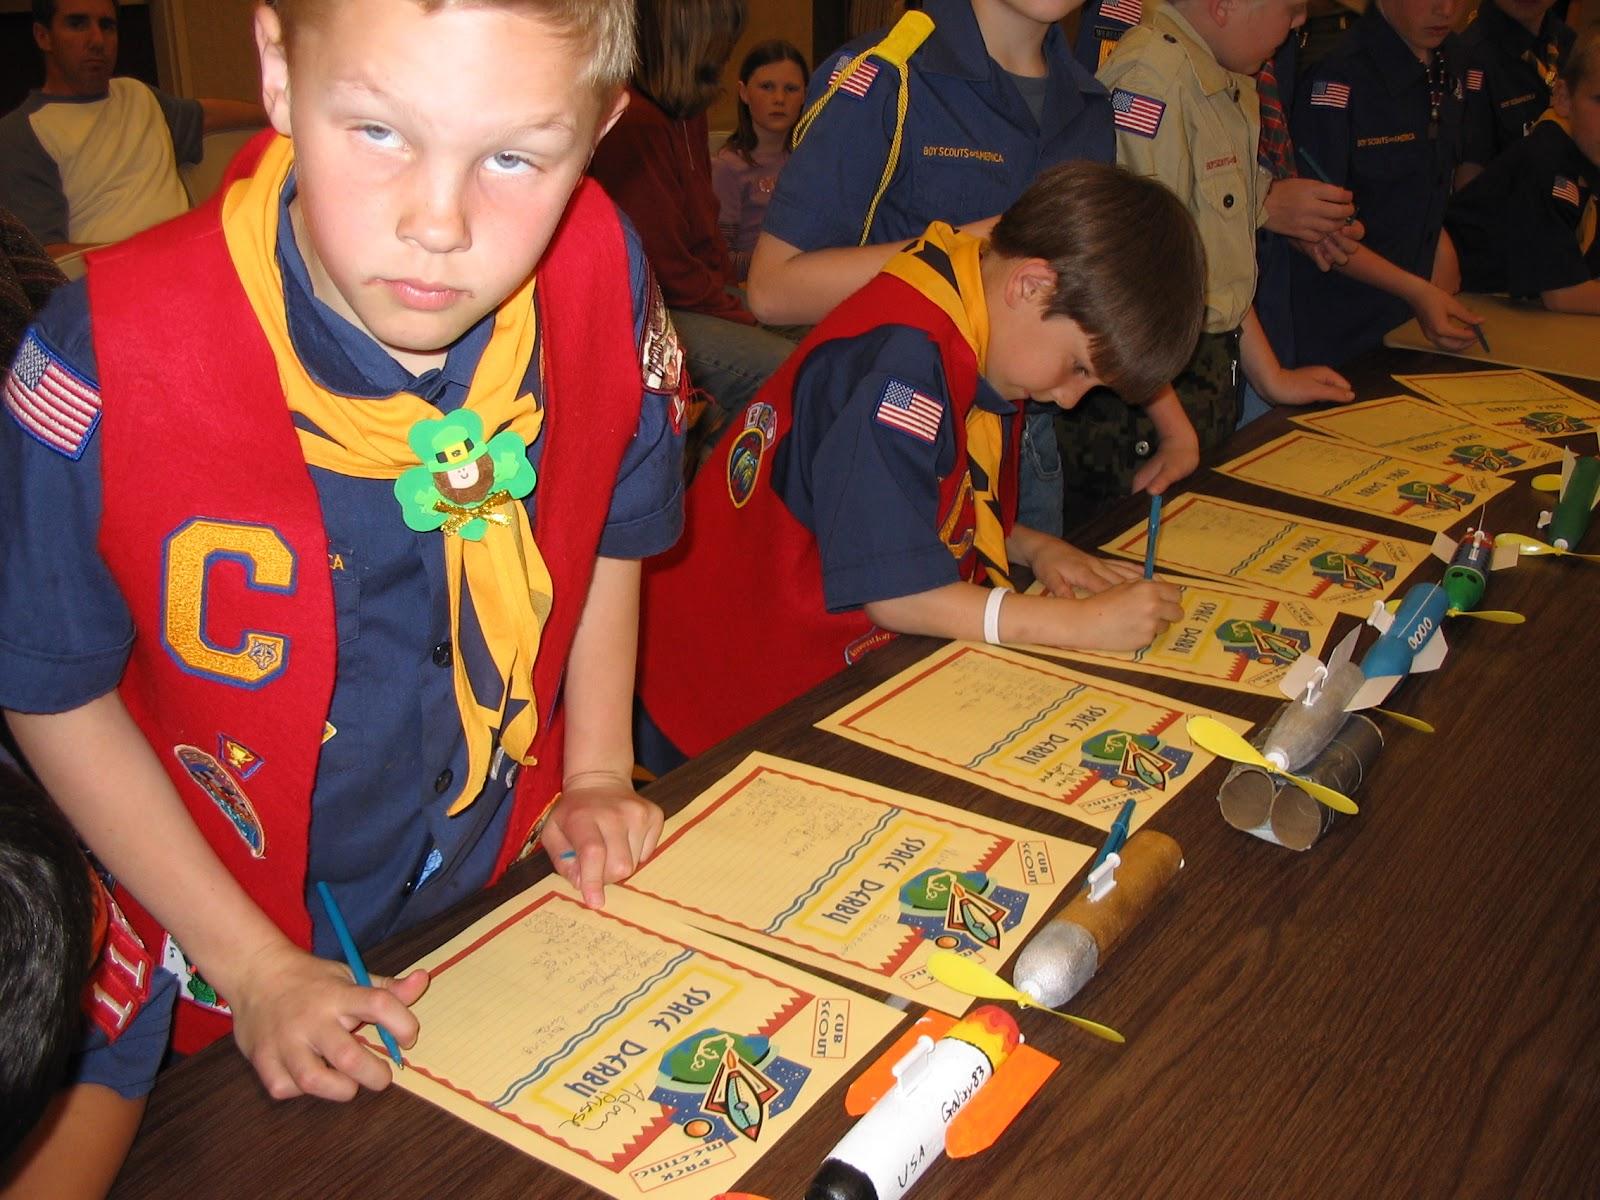 akela's council cub scout leader training: cub scout space derby ideas